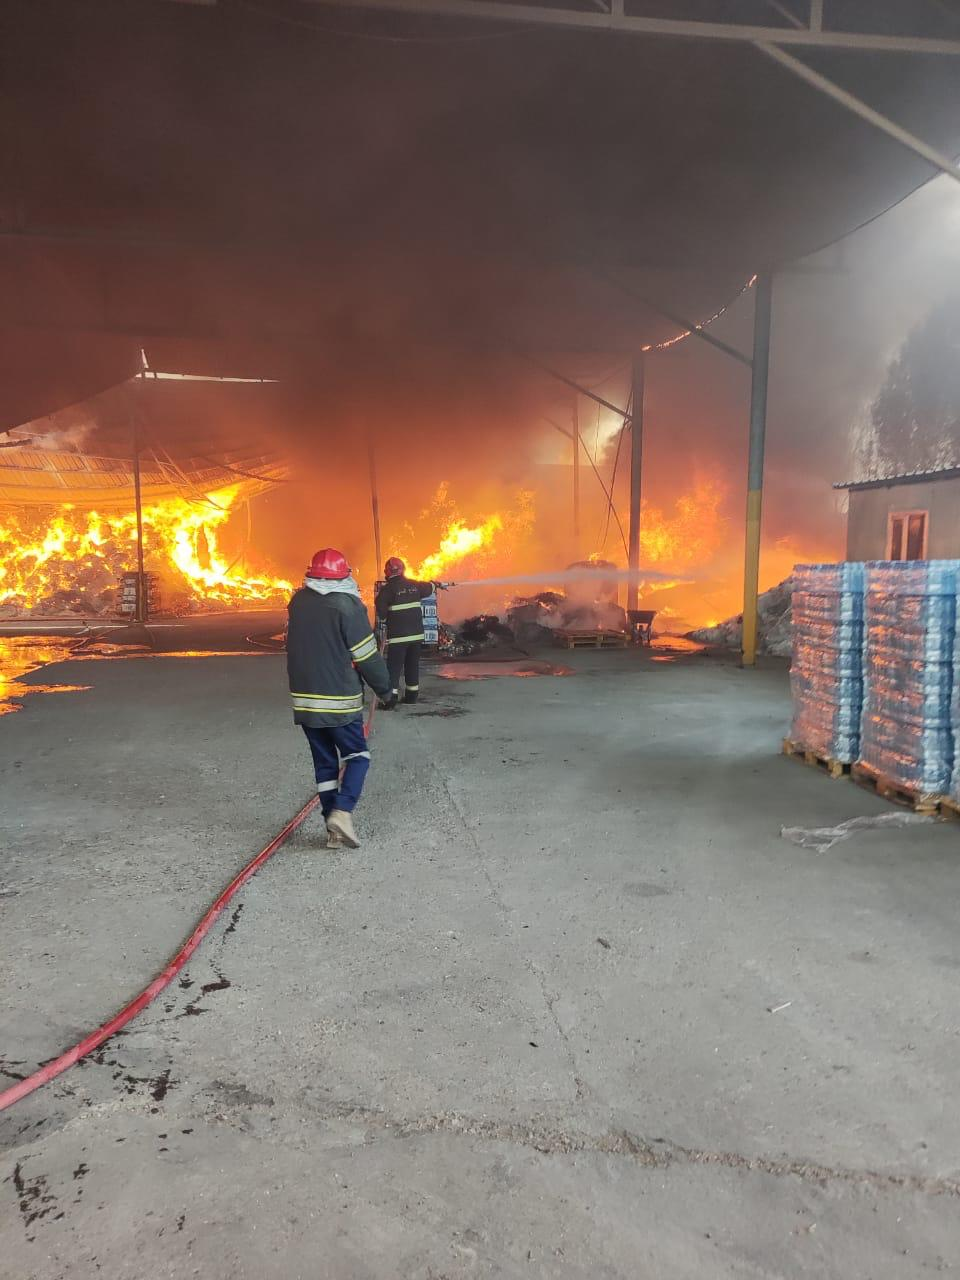 "خسائر فادحة بنشوب حريق ""هائل"" داخل معمل للعصائر شمالي بغداد .. صور"